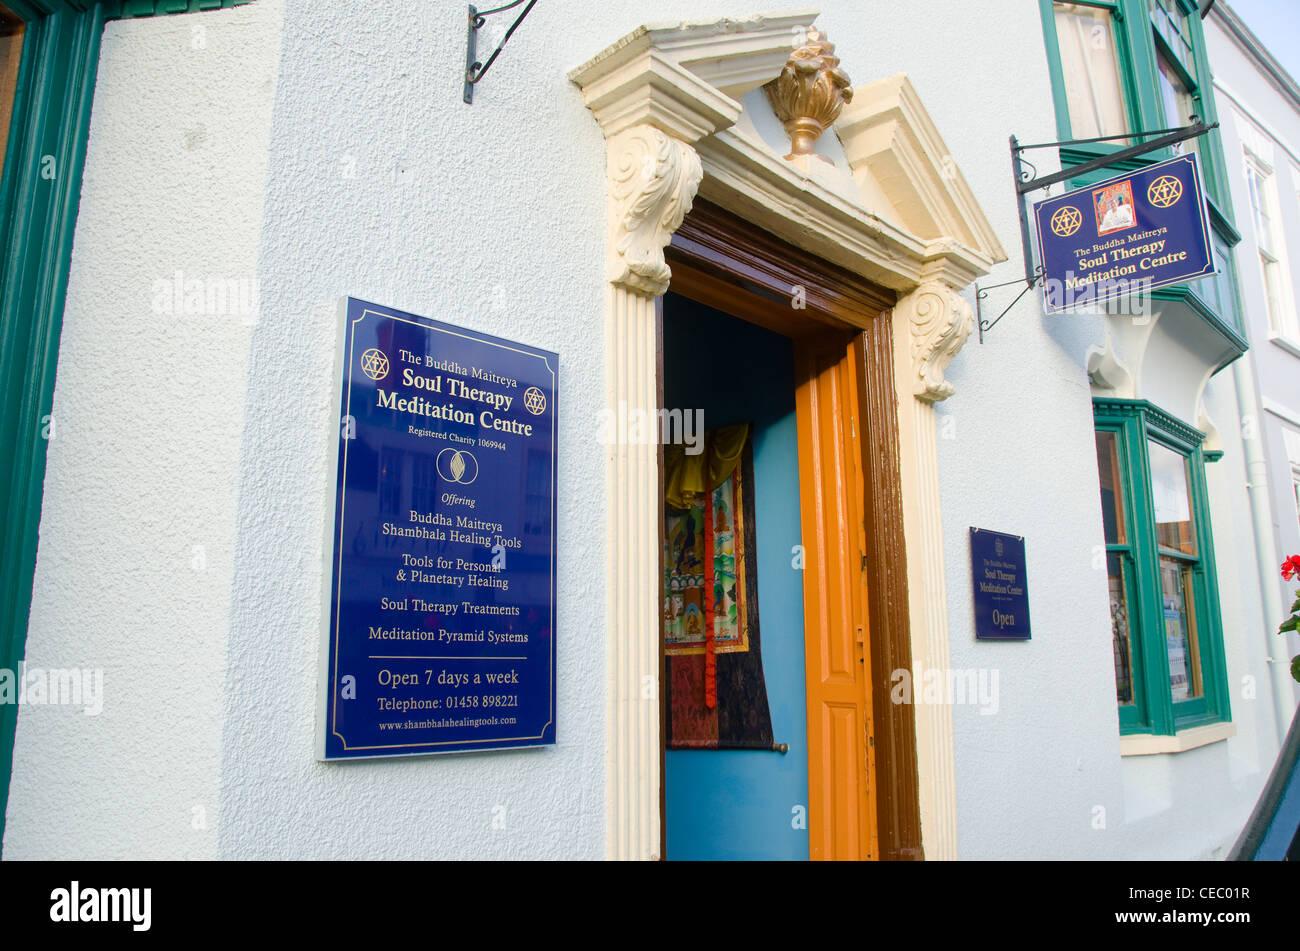 Soul therapy meditation centre, Glastonbury, Somerset , UK - Stock Image